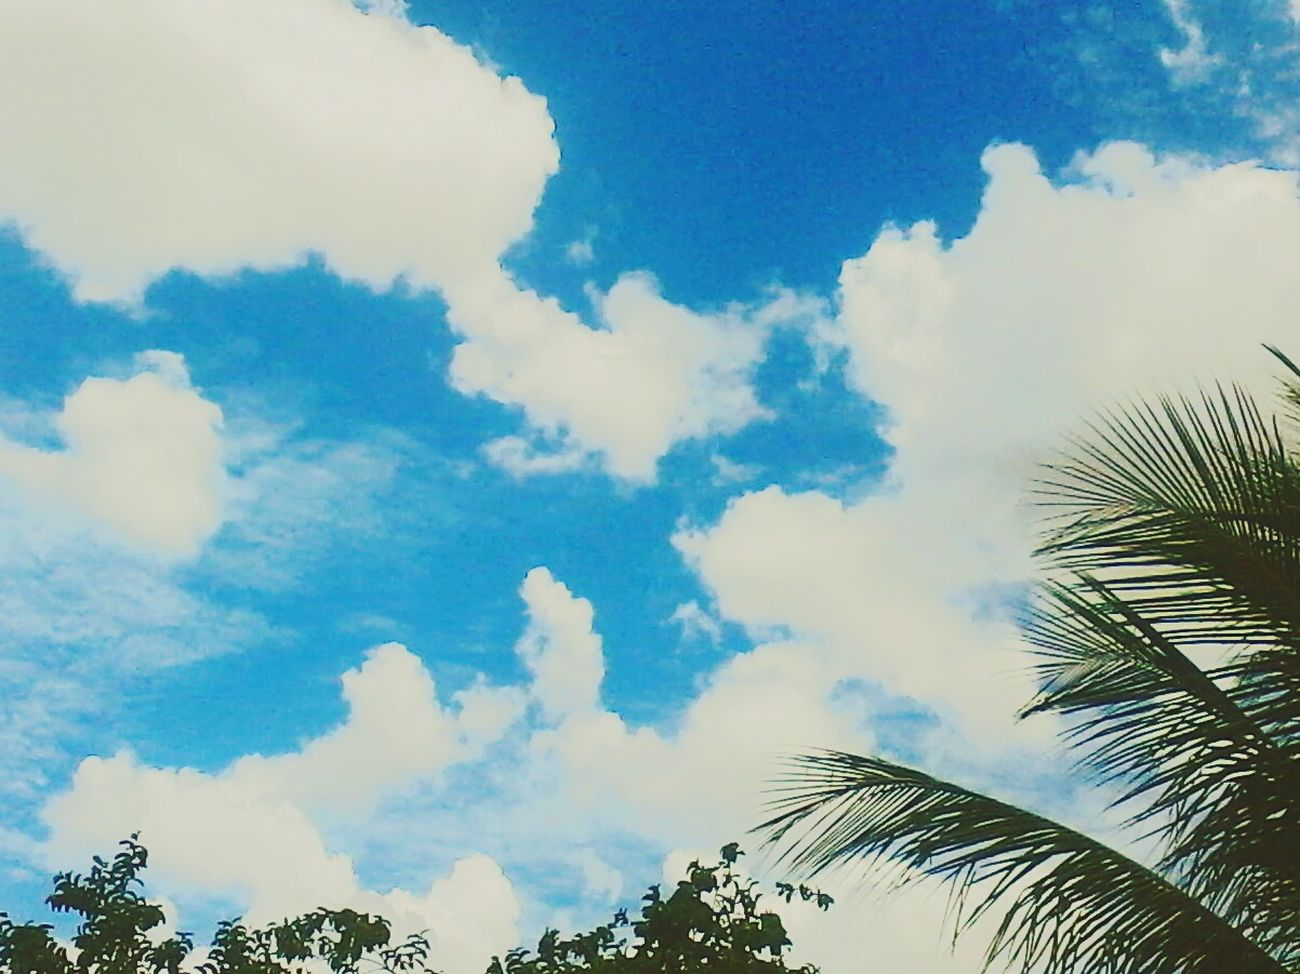 Céu Sky Collection Ceudays Ceu Liindo! Skyline CeuAzul Sky And Trees Skyscrapers Ceumaravilhoso CeuPerfeito Skylovers